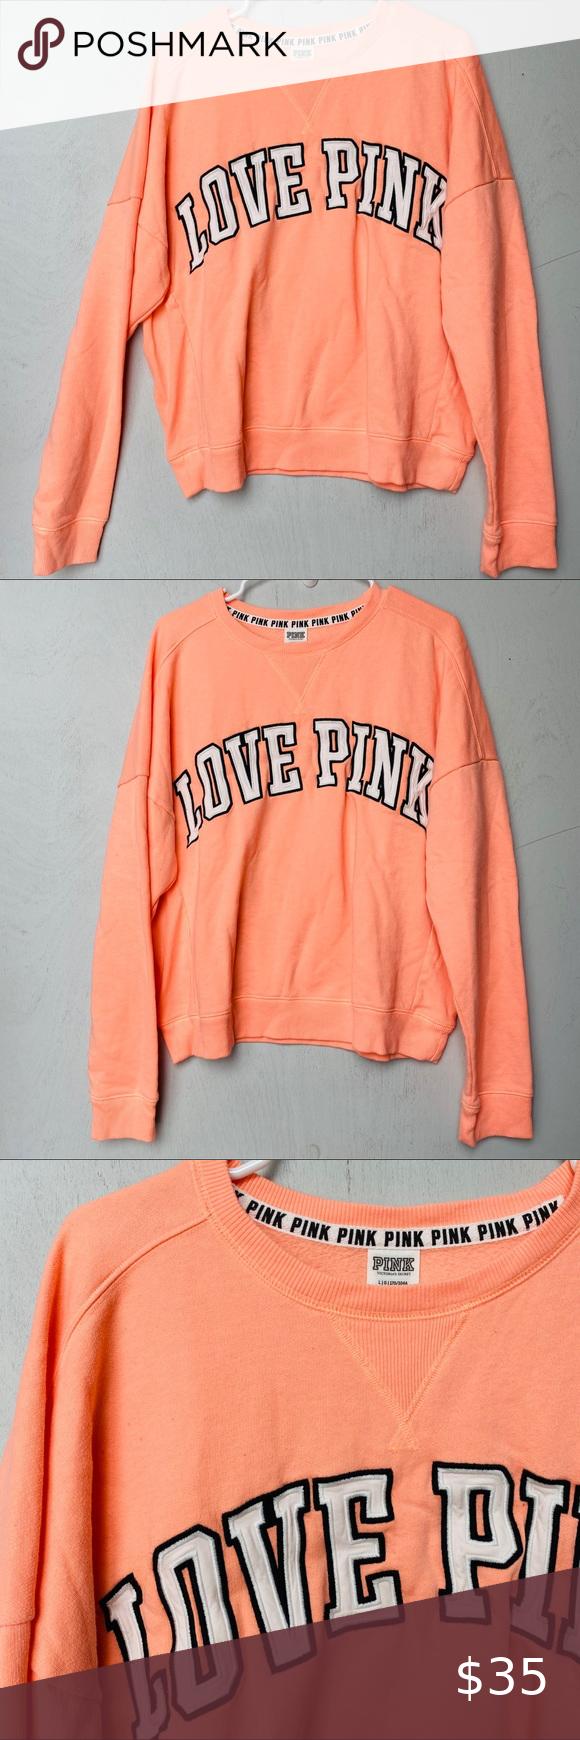 Pink By Vs Peach Neon Orange Crew Neck Sweater Crew Neck Sweater Neon Orange Pink Sweater Victoria Secret [ 1740 x 580 Pixel ]